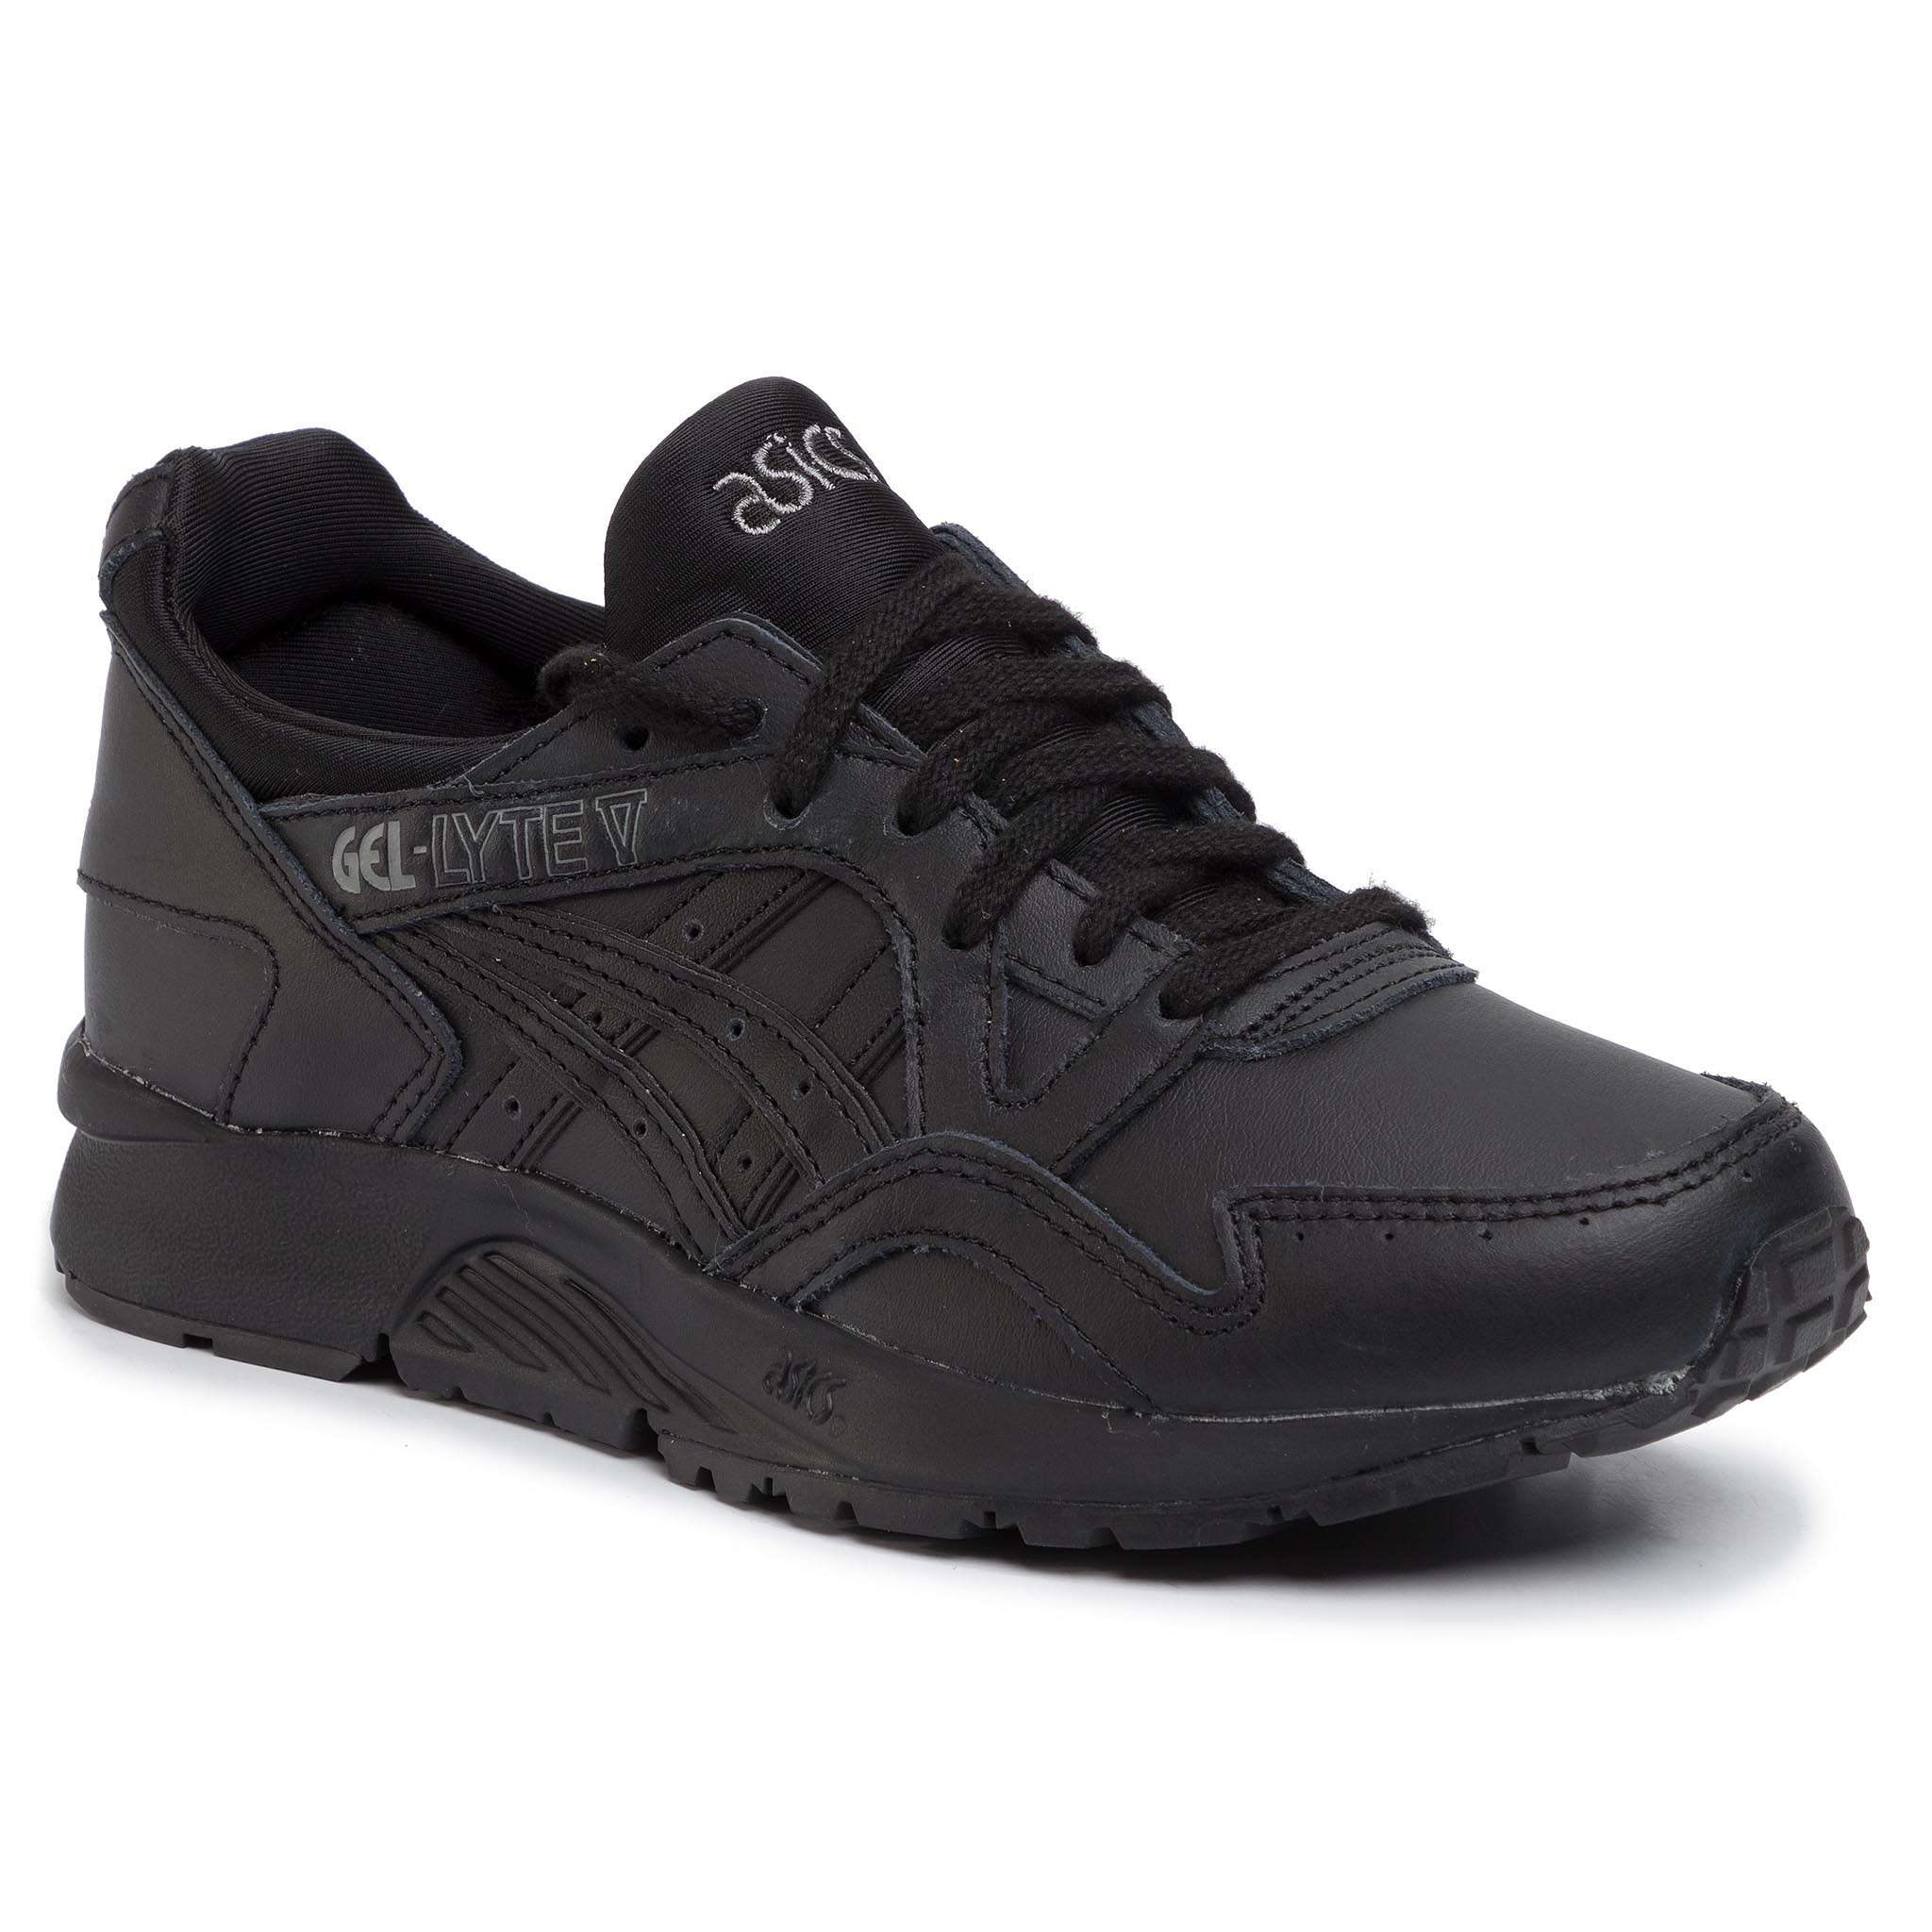 Sneakersy ASICS - Gel-Lyte V H6R3L Black/Black 9090